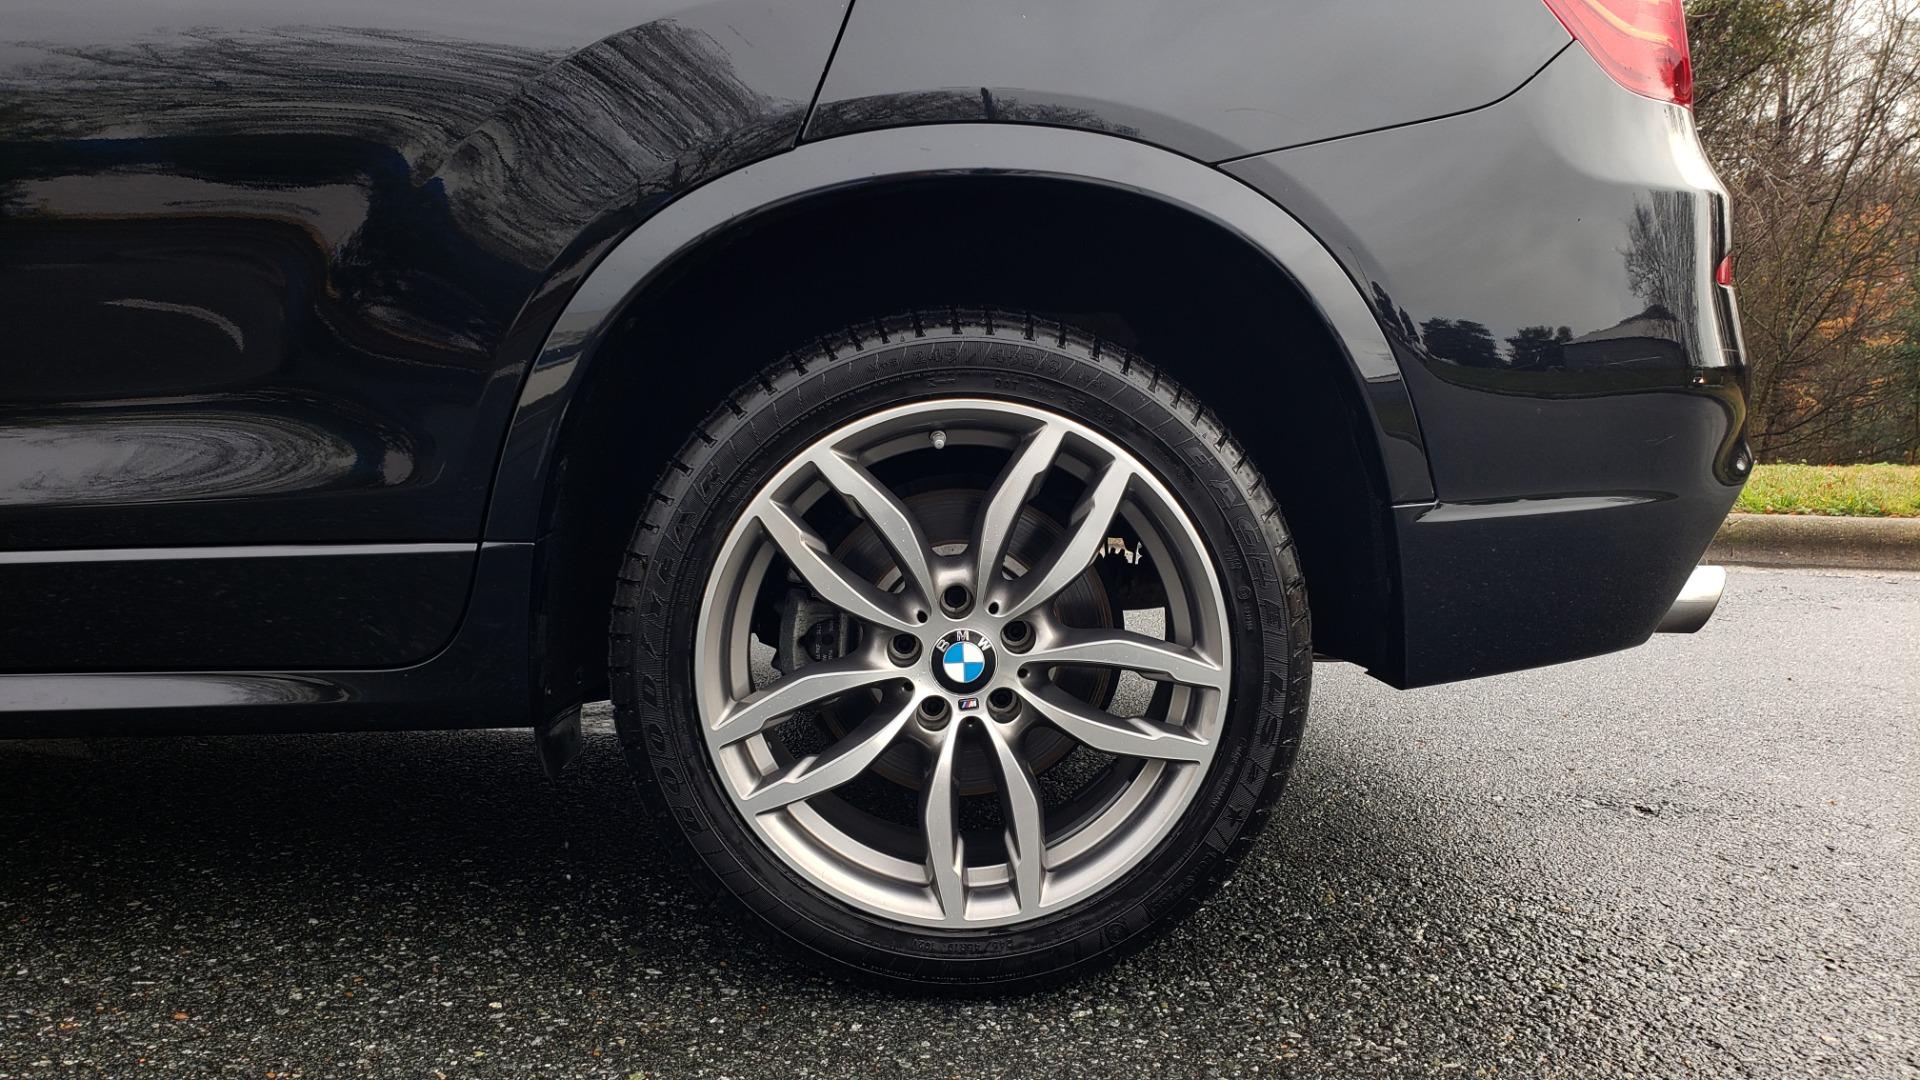 Used 2017 BMW X3 XDRIVE35I M-SPORT / DRVR ASST PLUS / TECHNOLOGY / HUD / BLIND SPOT for sale Sold at Formula Imports in Charlotte NC 28227 75